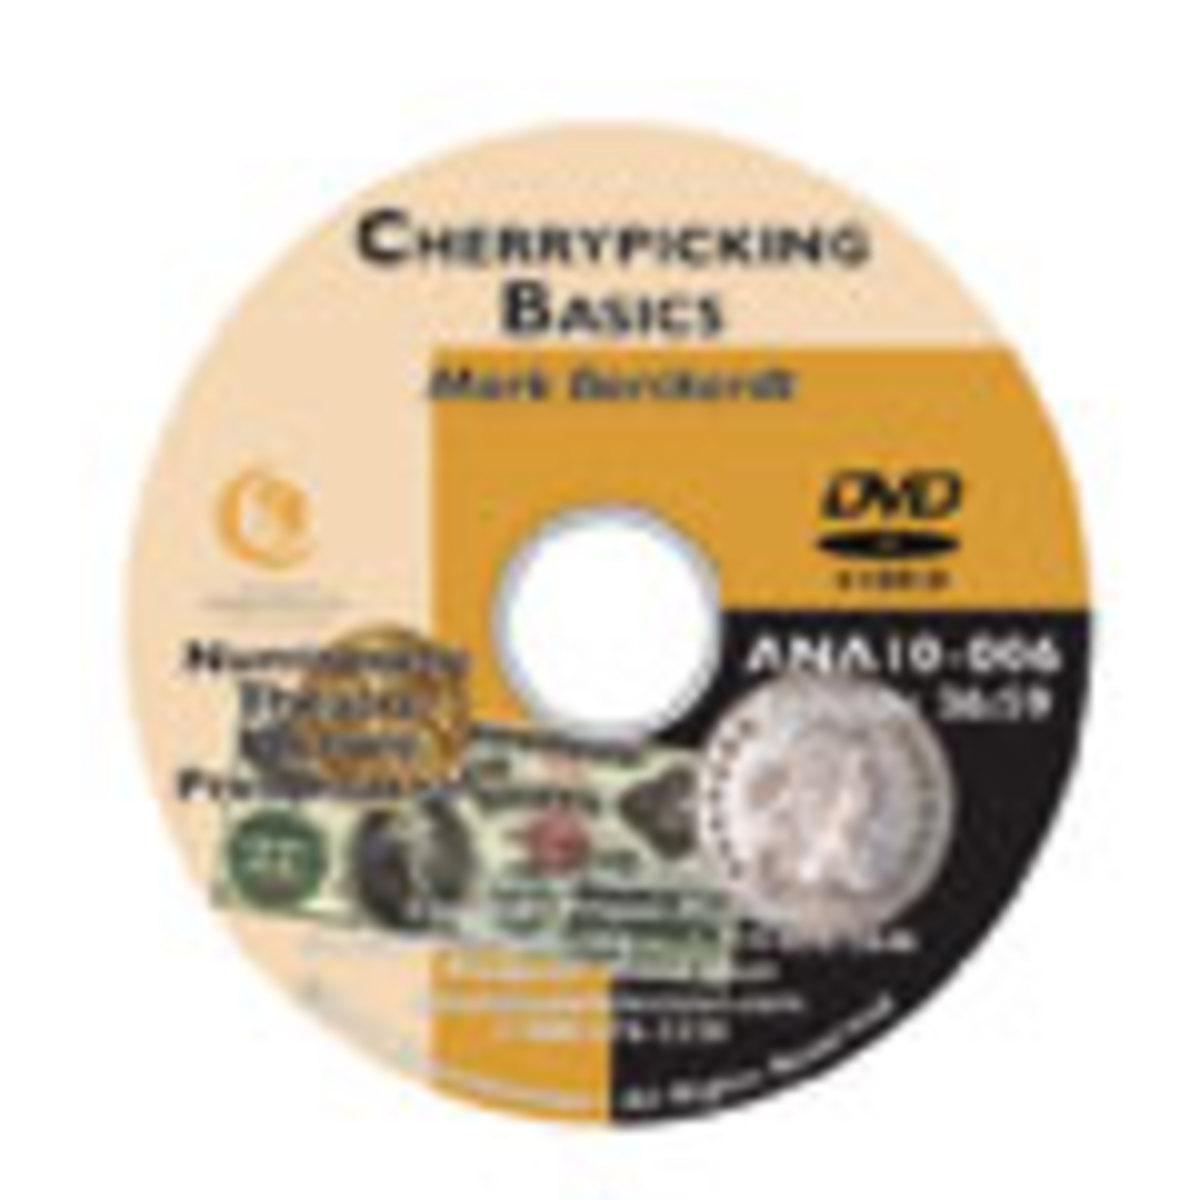 Cherrypicking Basics